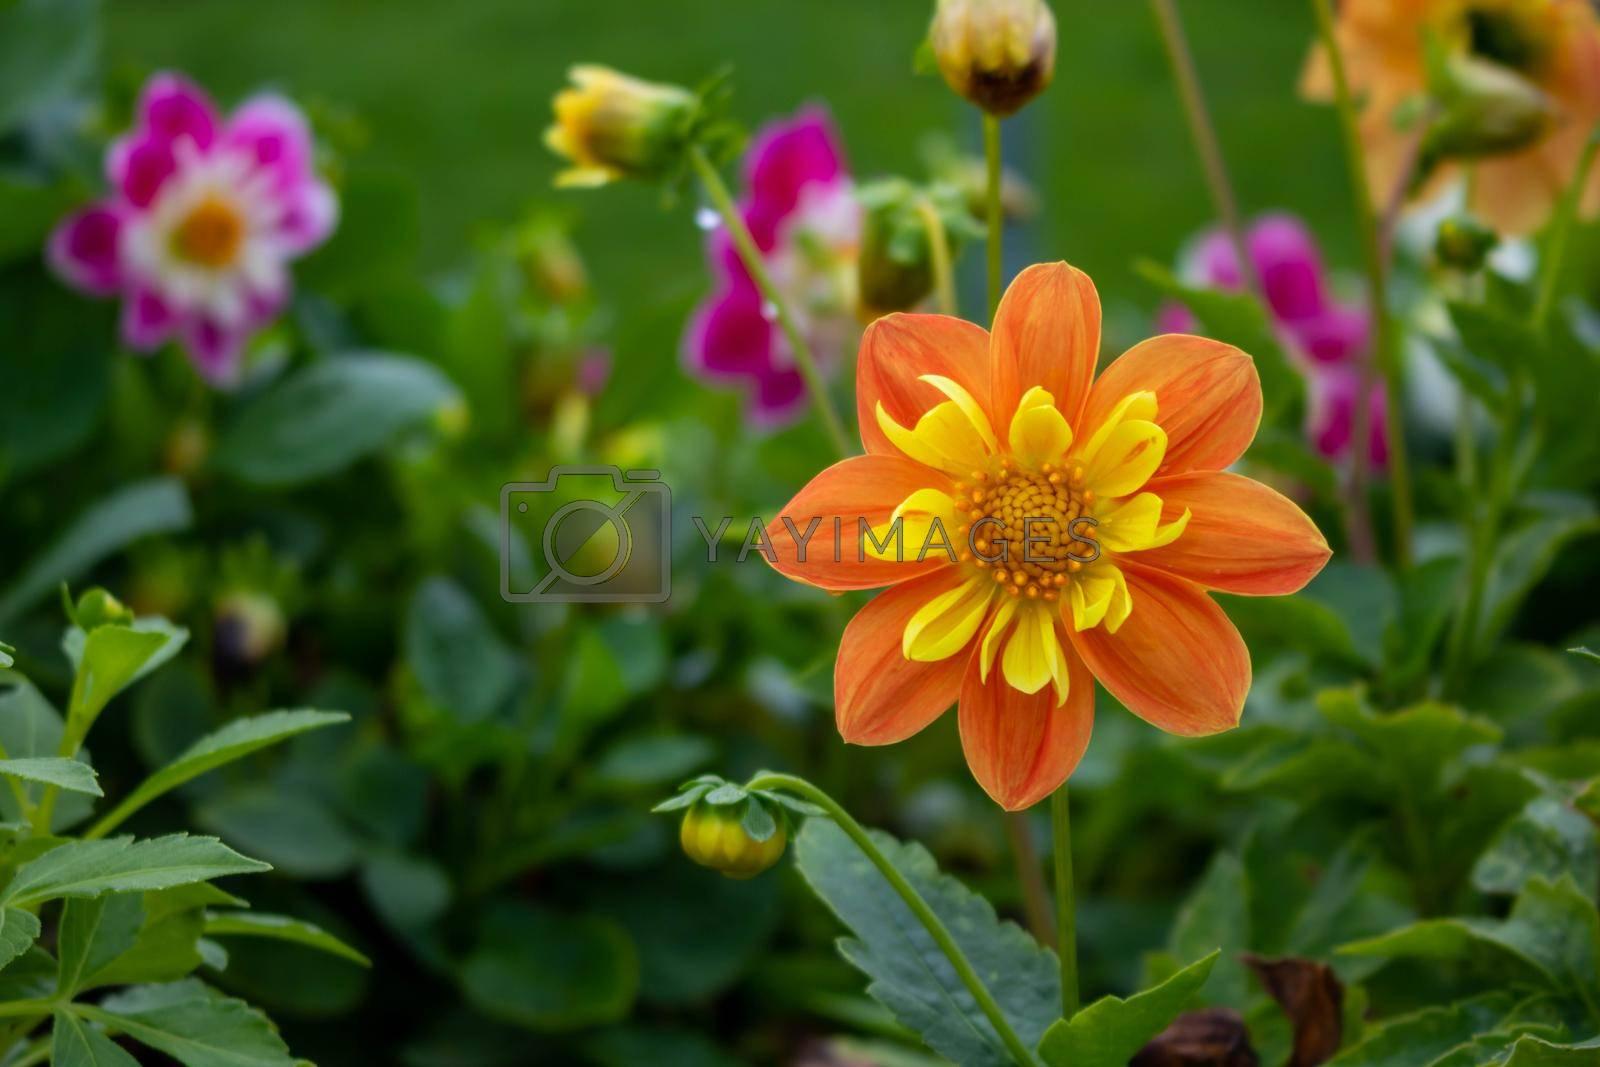 Royalty free image of Orange Dahlia on a green flower bed by lapushka62